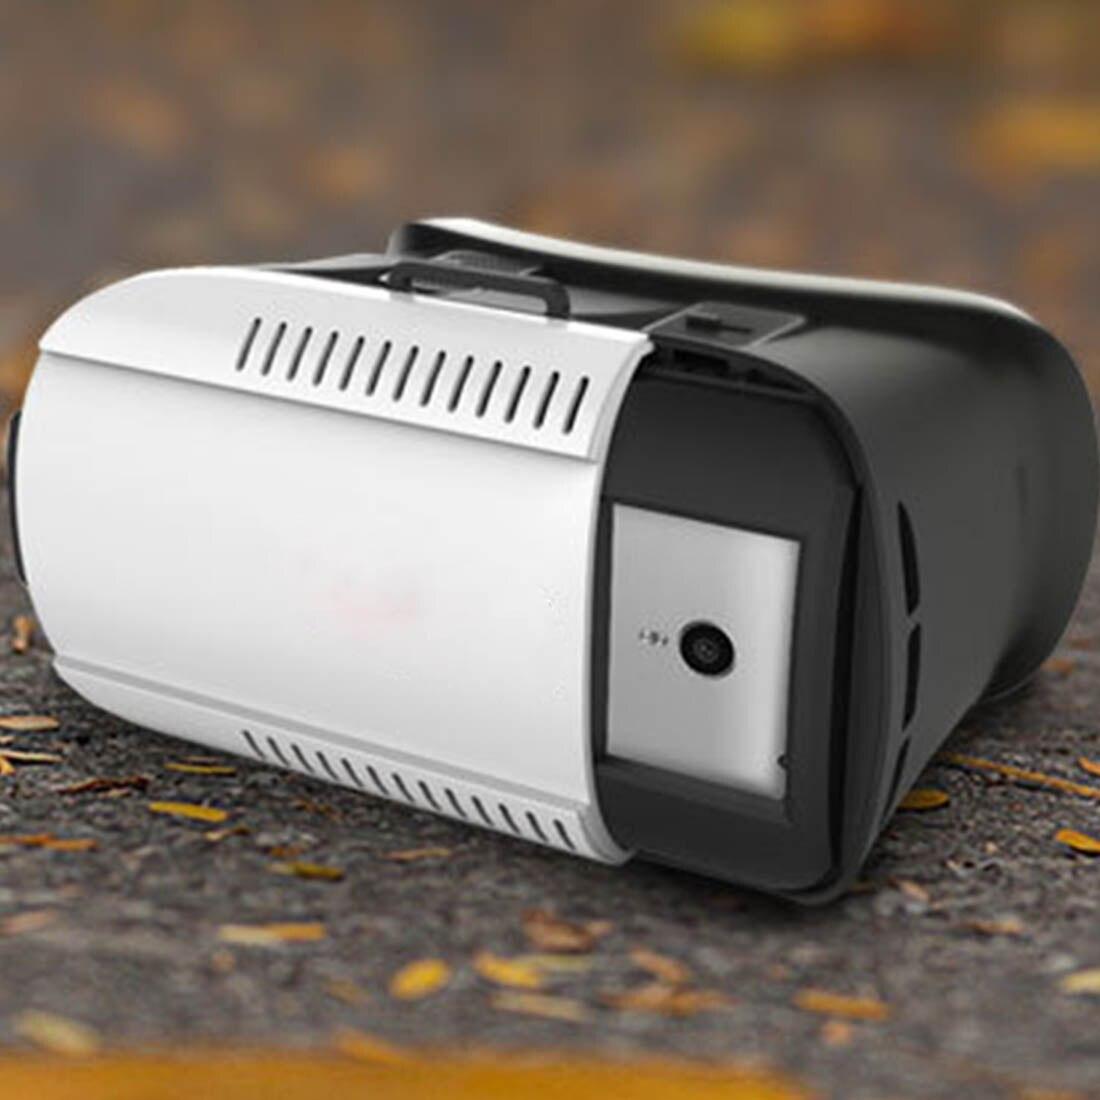 Marsnaska Google Cardboard VR BOX 1 Virtual Reality 3D Glasses Virtual Reality VR Glass Hot Sale And High Quality